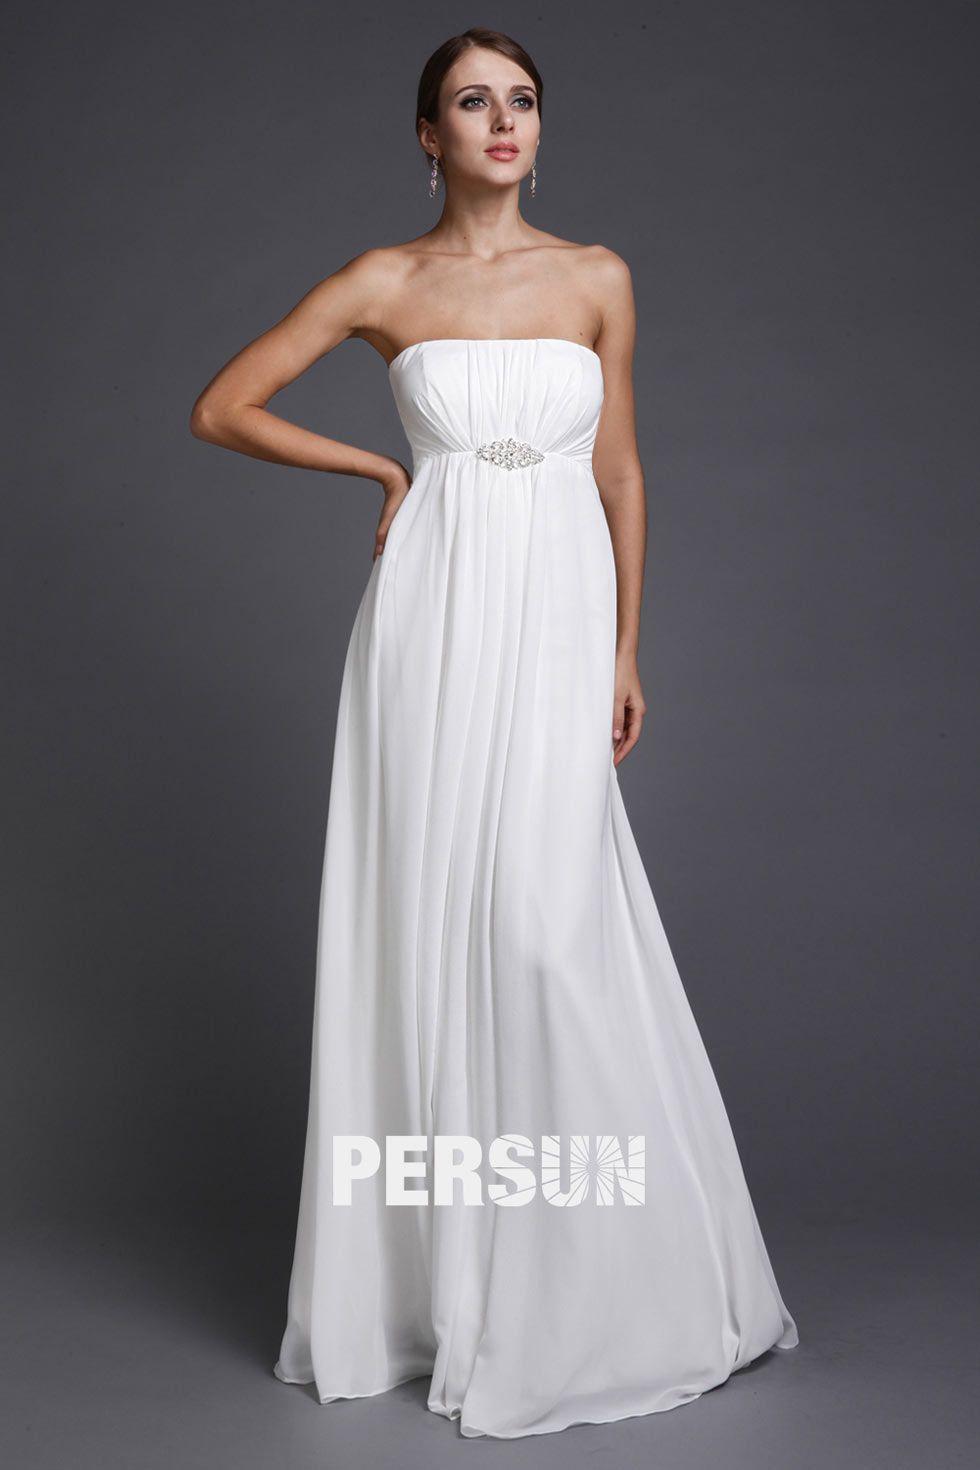 f15f417f1a2 Simple robe blanche longue bustier droit empire - Robedesoireelongue ...